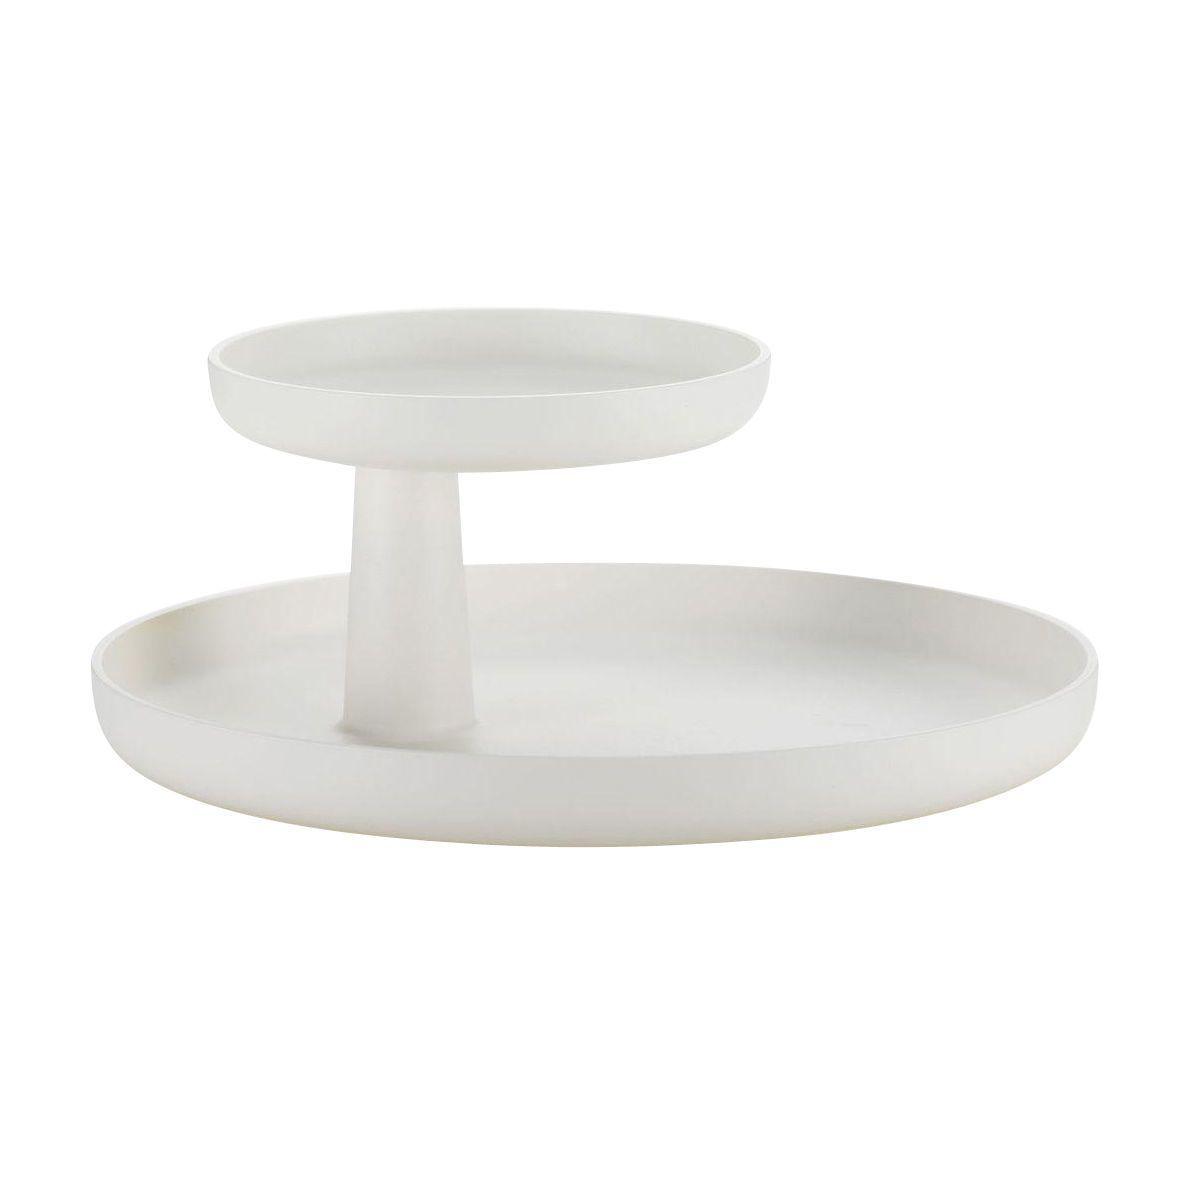 rotary tray vitra. Black Bedroom Furniture Sets. Home Design Ideas